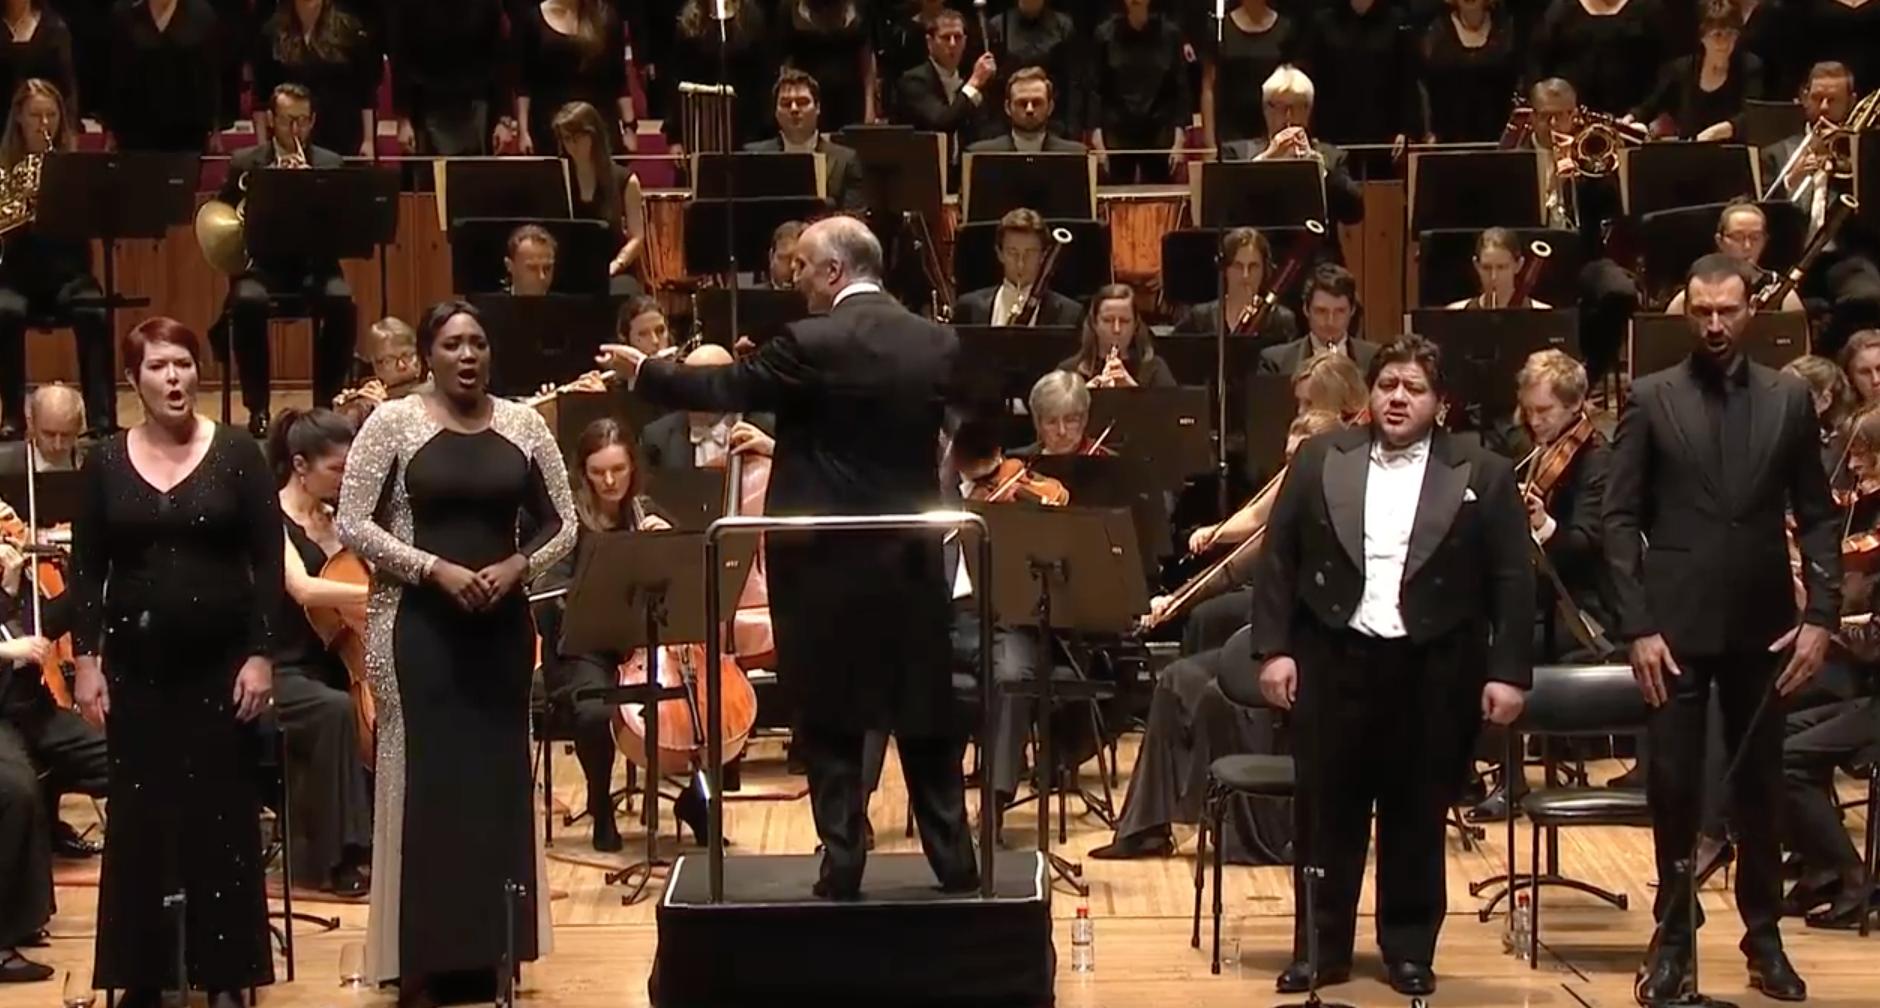 Verdi, Requiem, SSO, Sydney Symphony Orchestra